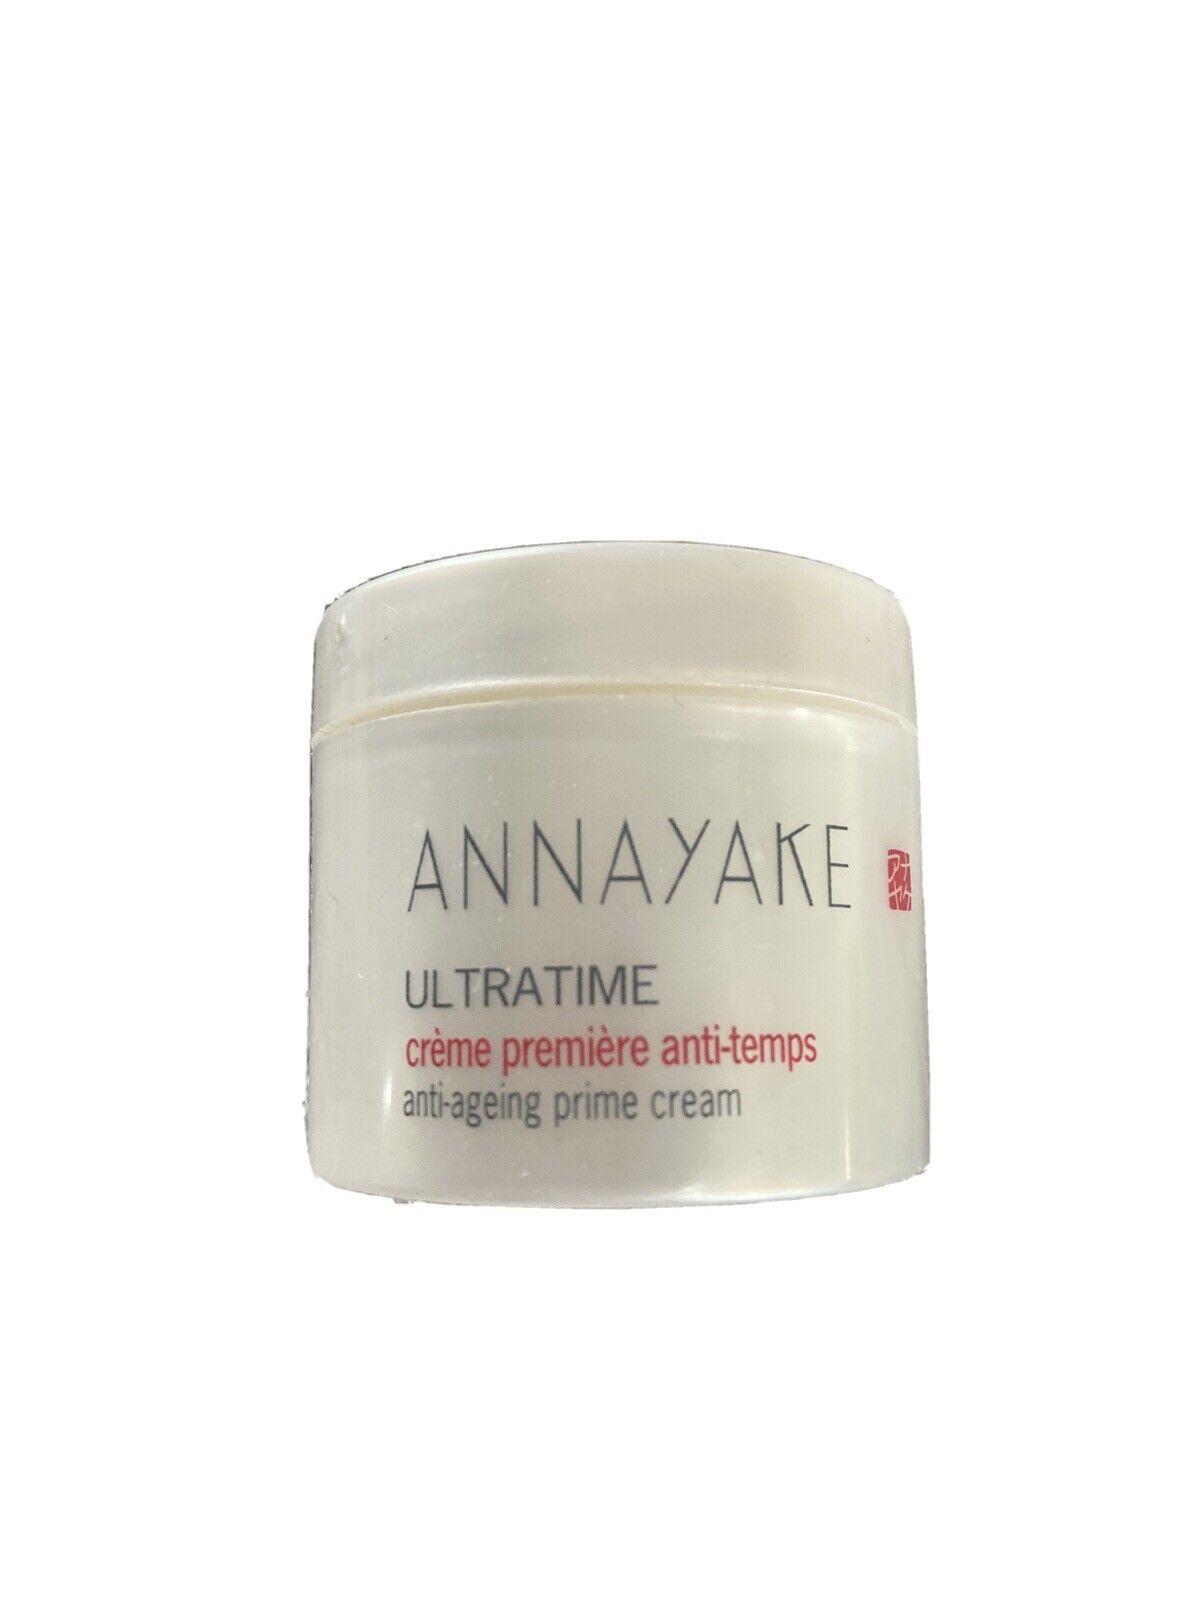 Annayake Ultratime Creme Premiere Anti temps, 15ml Neu